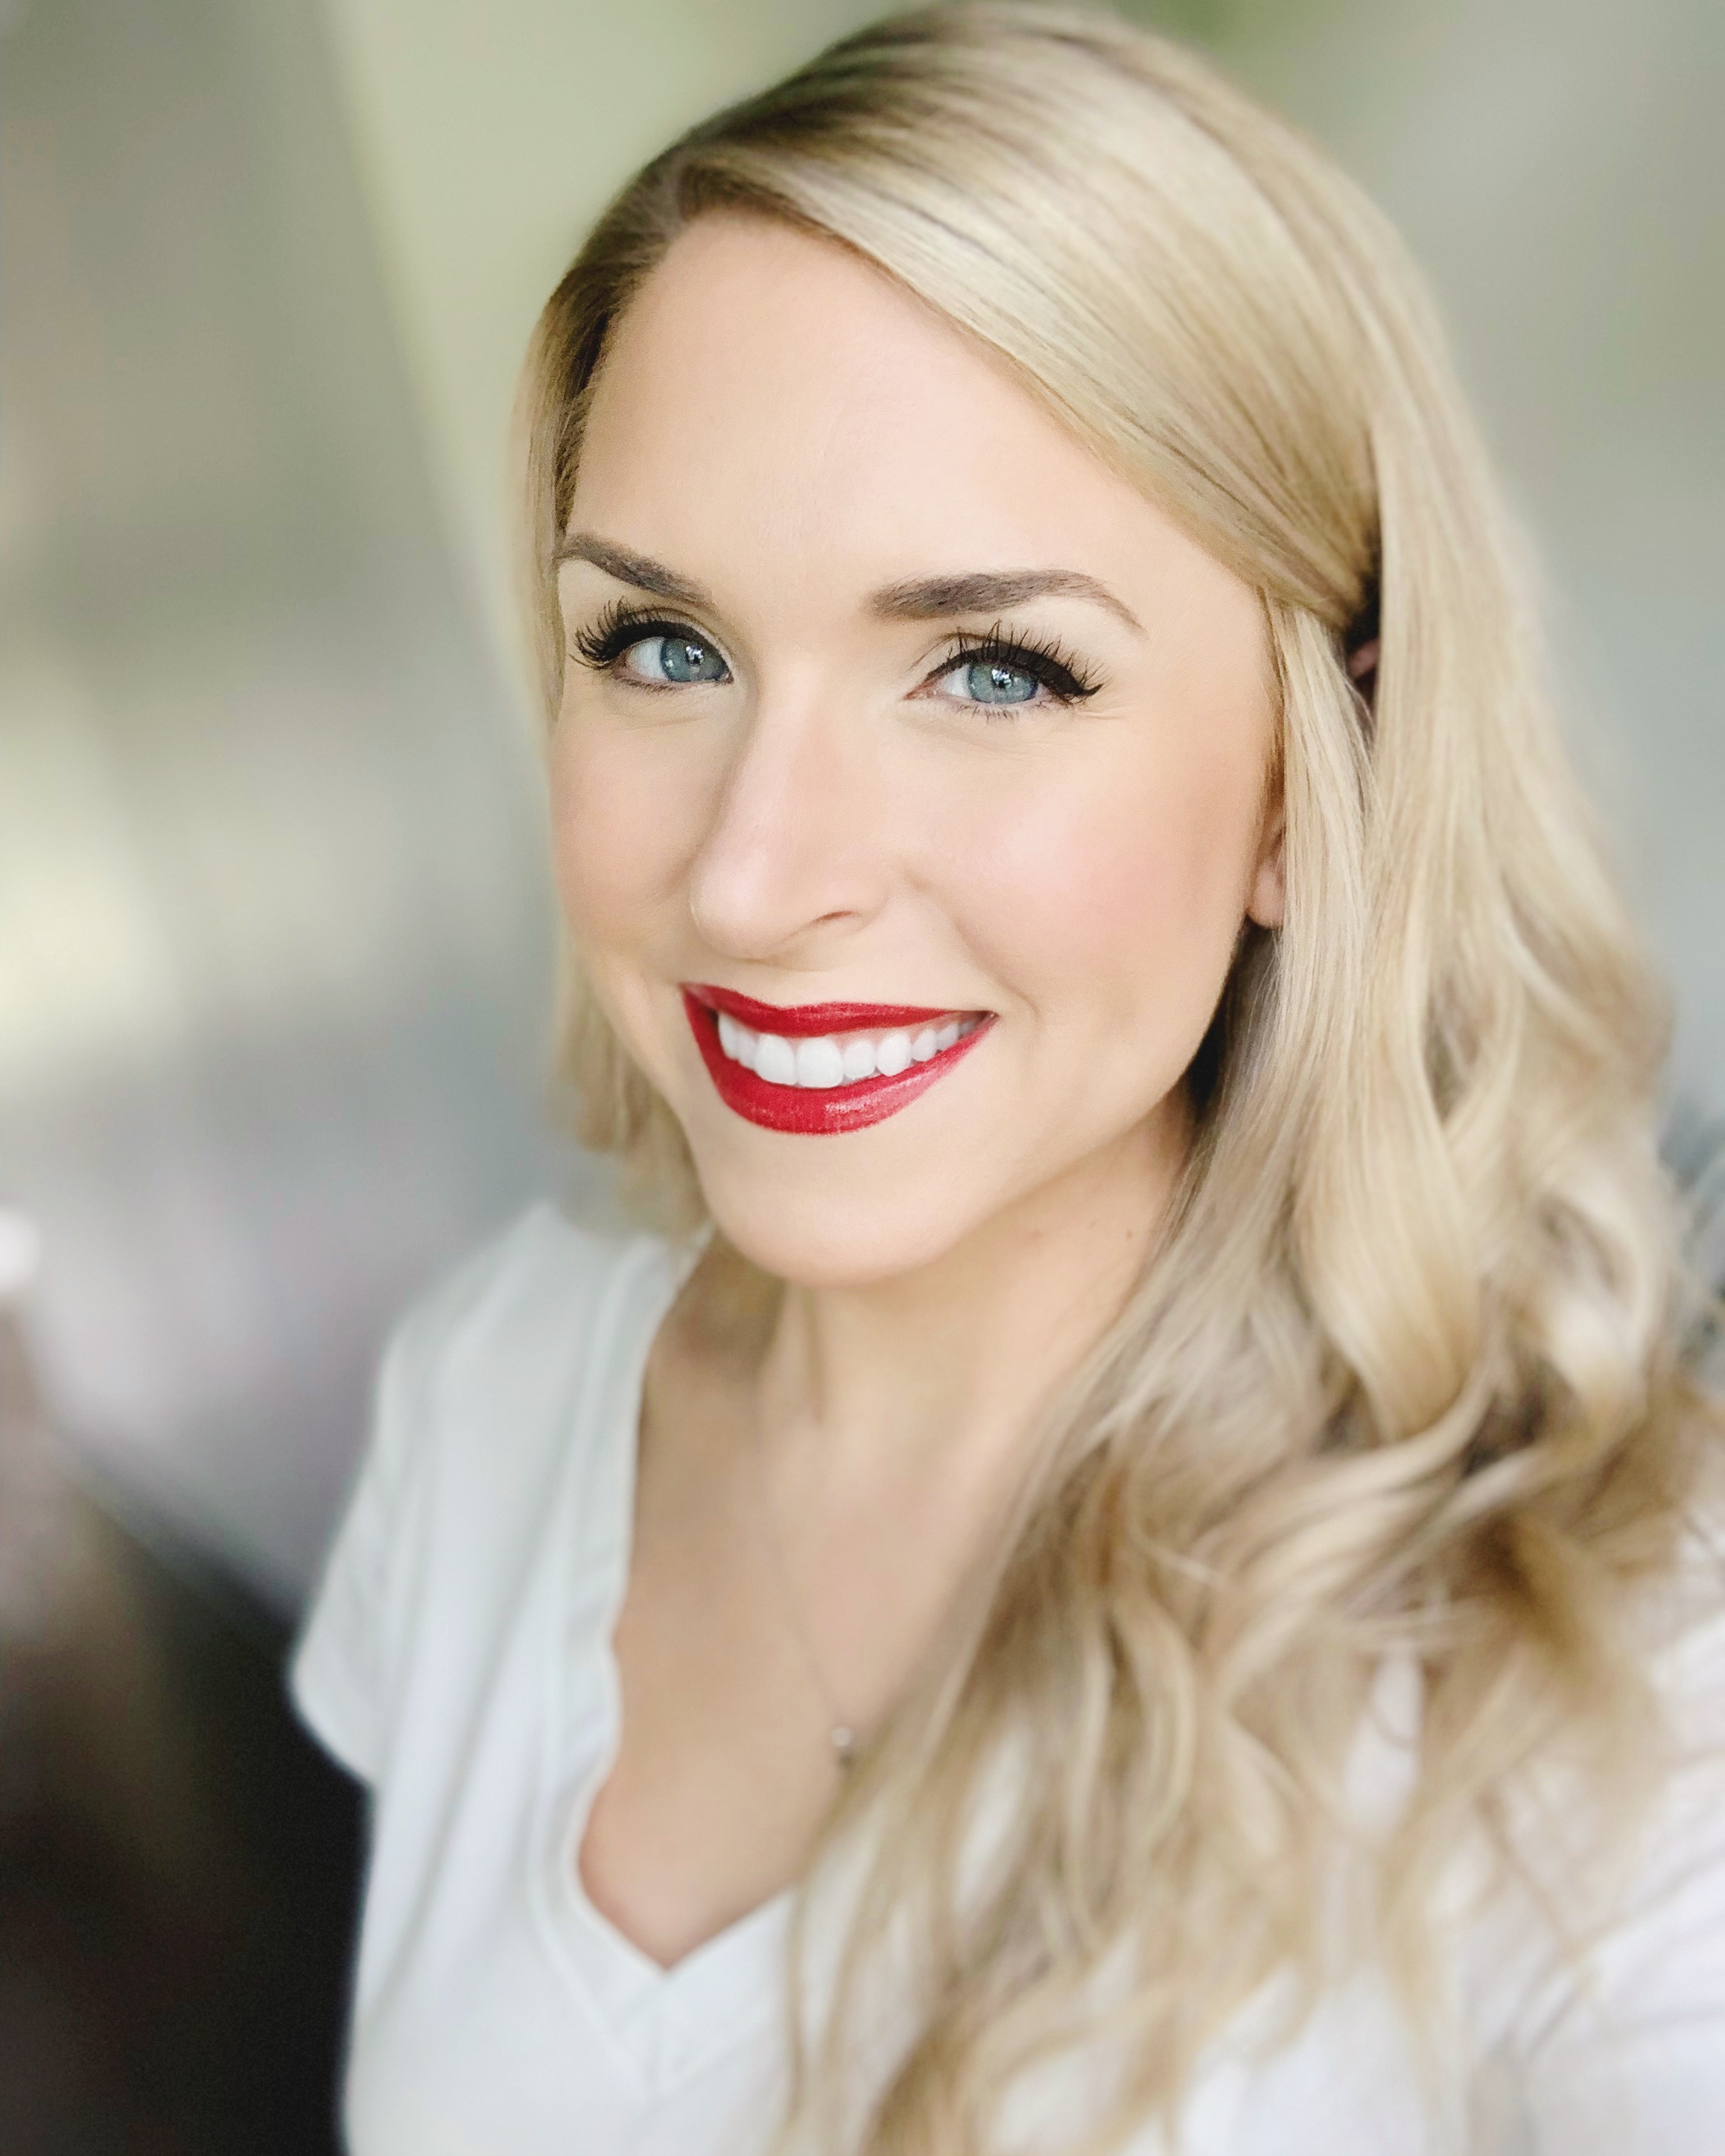 Mallory-ennis-mom-blog-beauty-tips